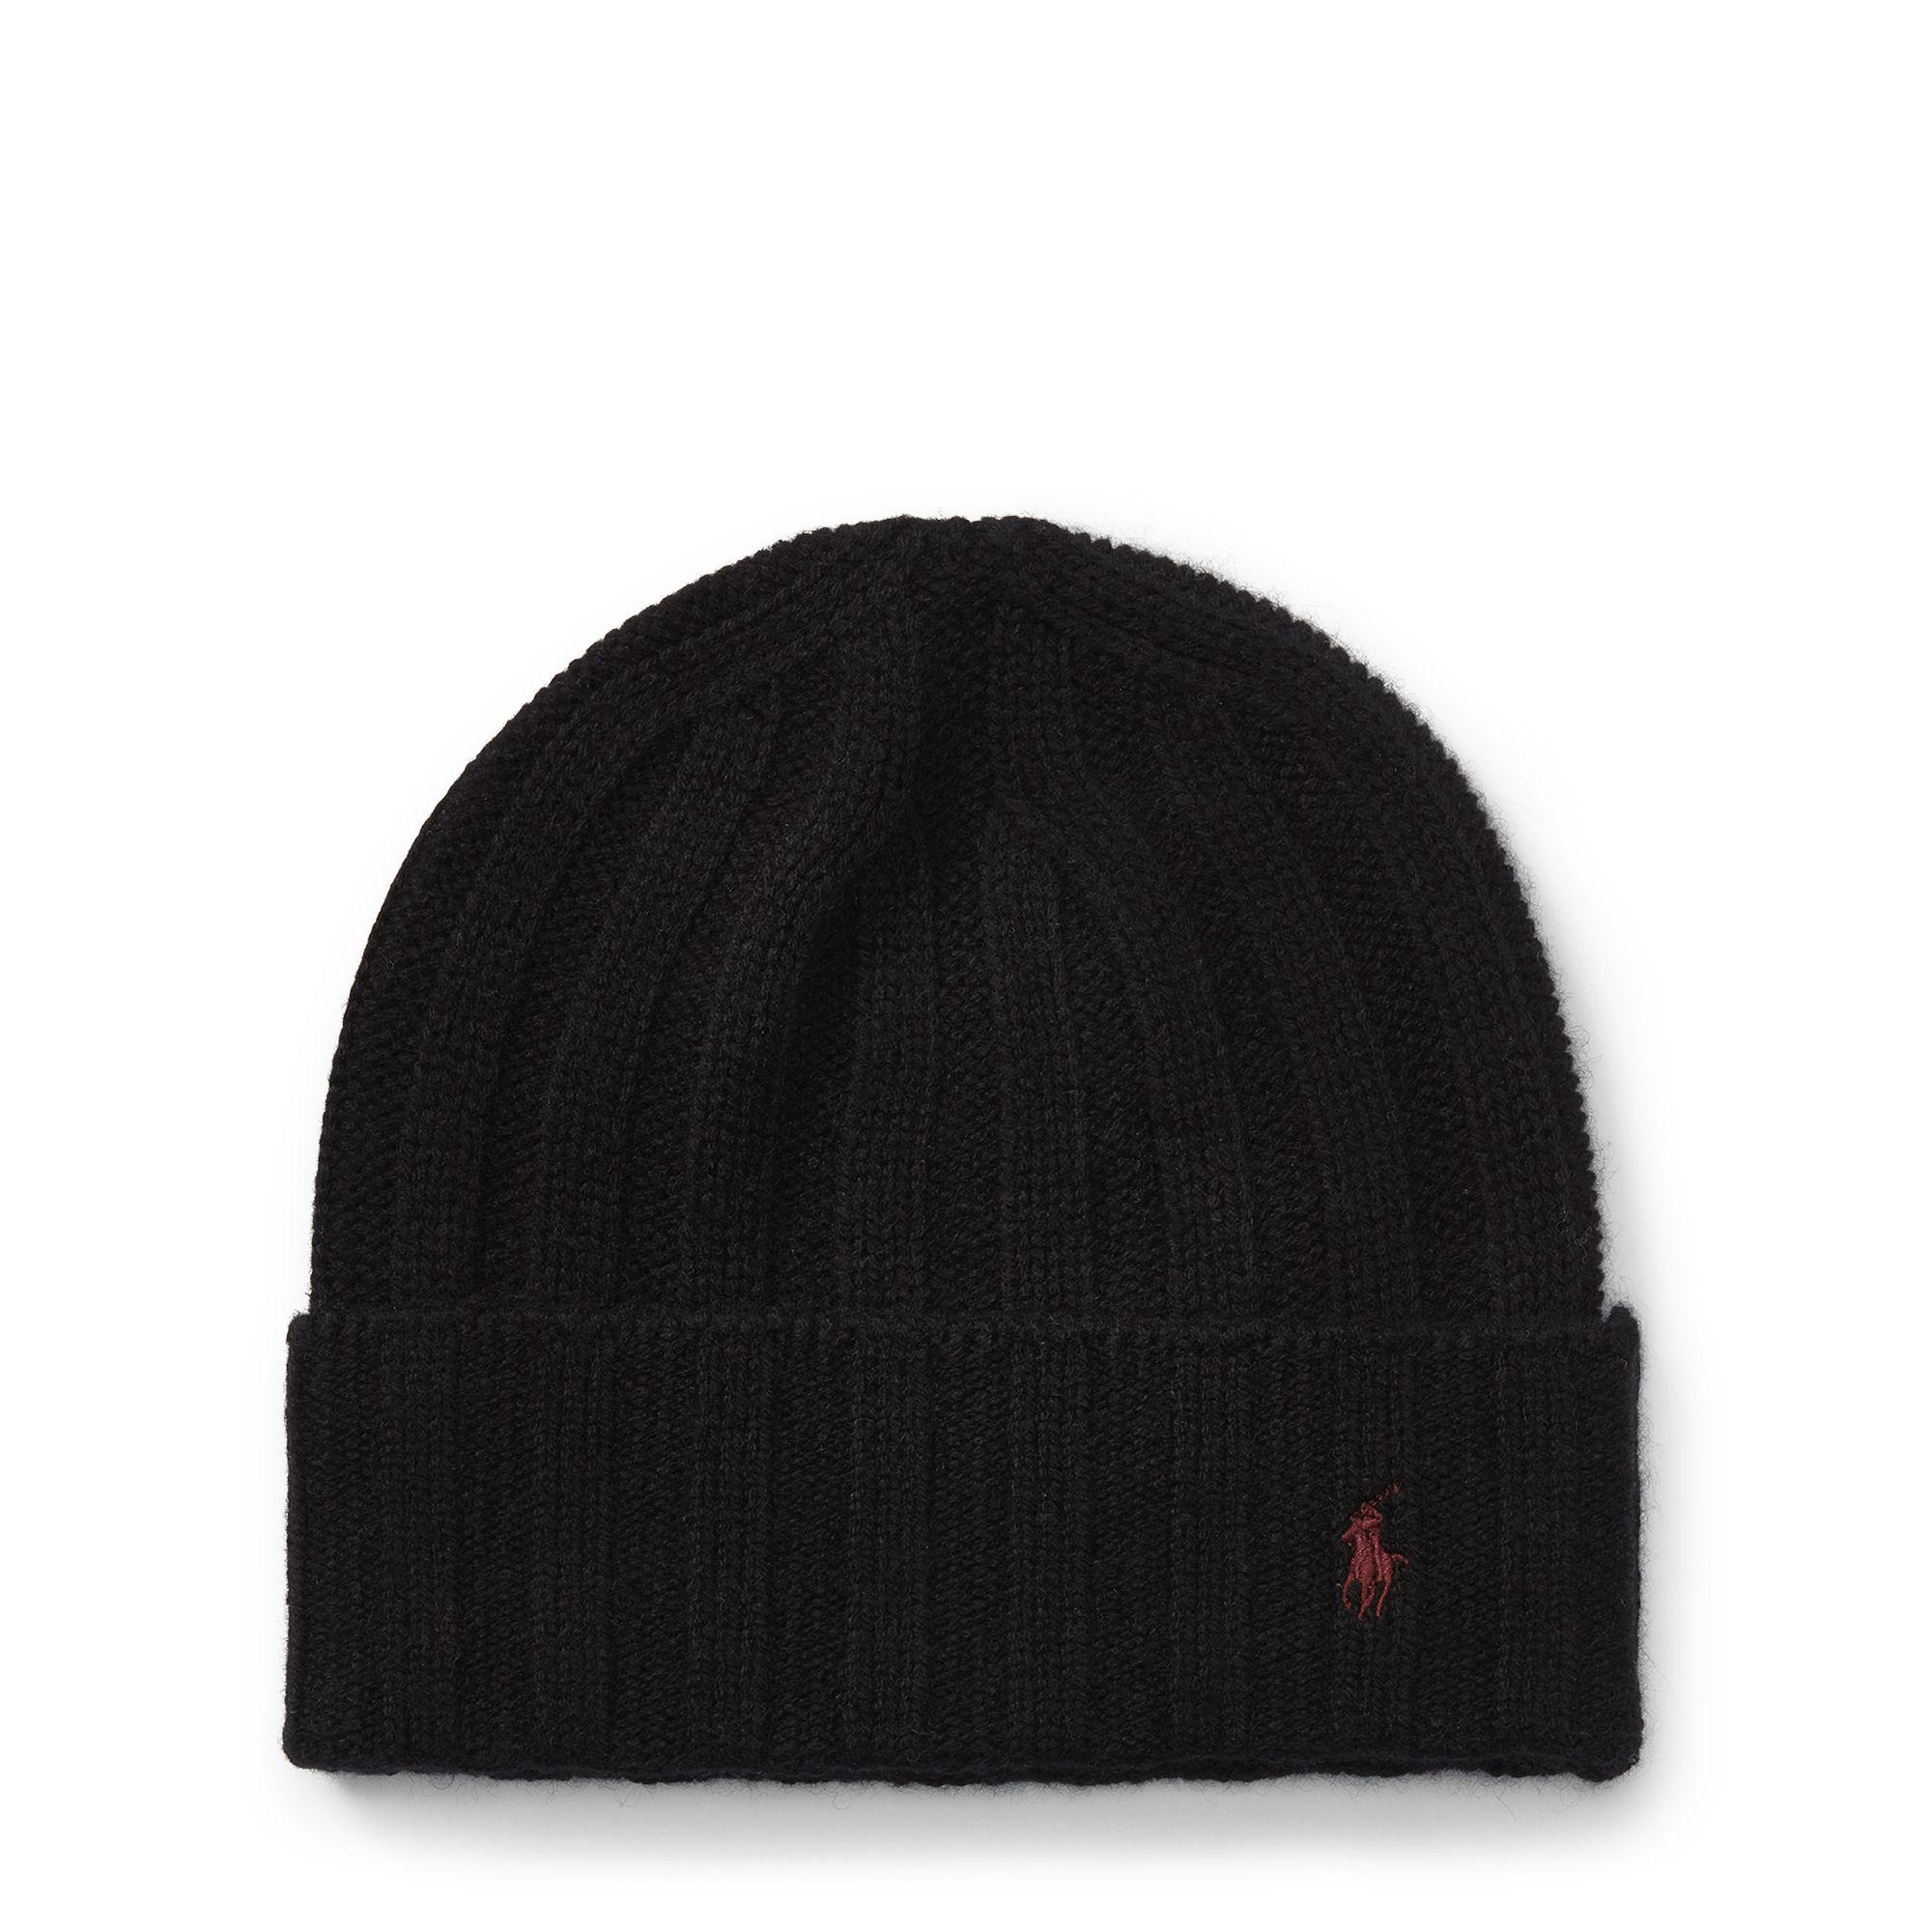 Lyst - Polo Ralph Lauren Wide-rib Cashmere-wool Cap in Black for Men 339e2f3c376a